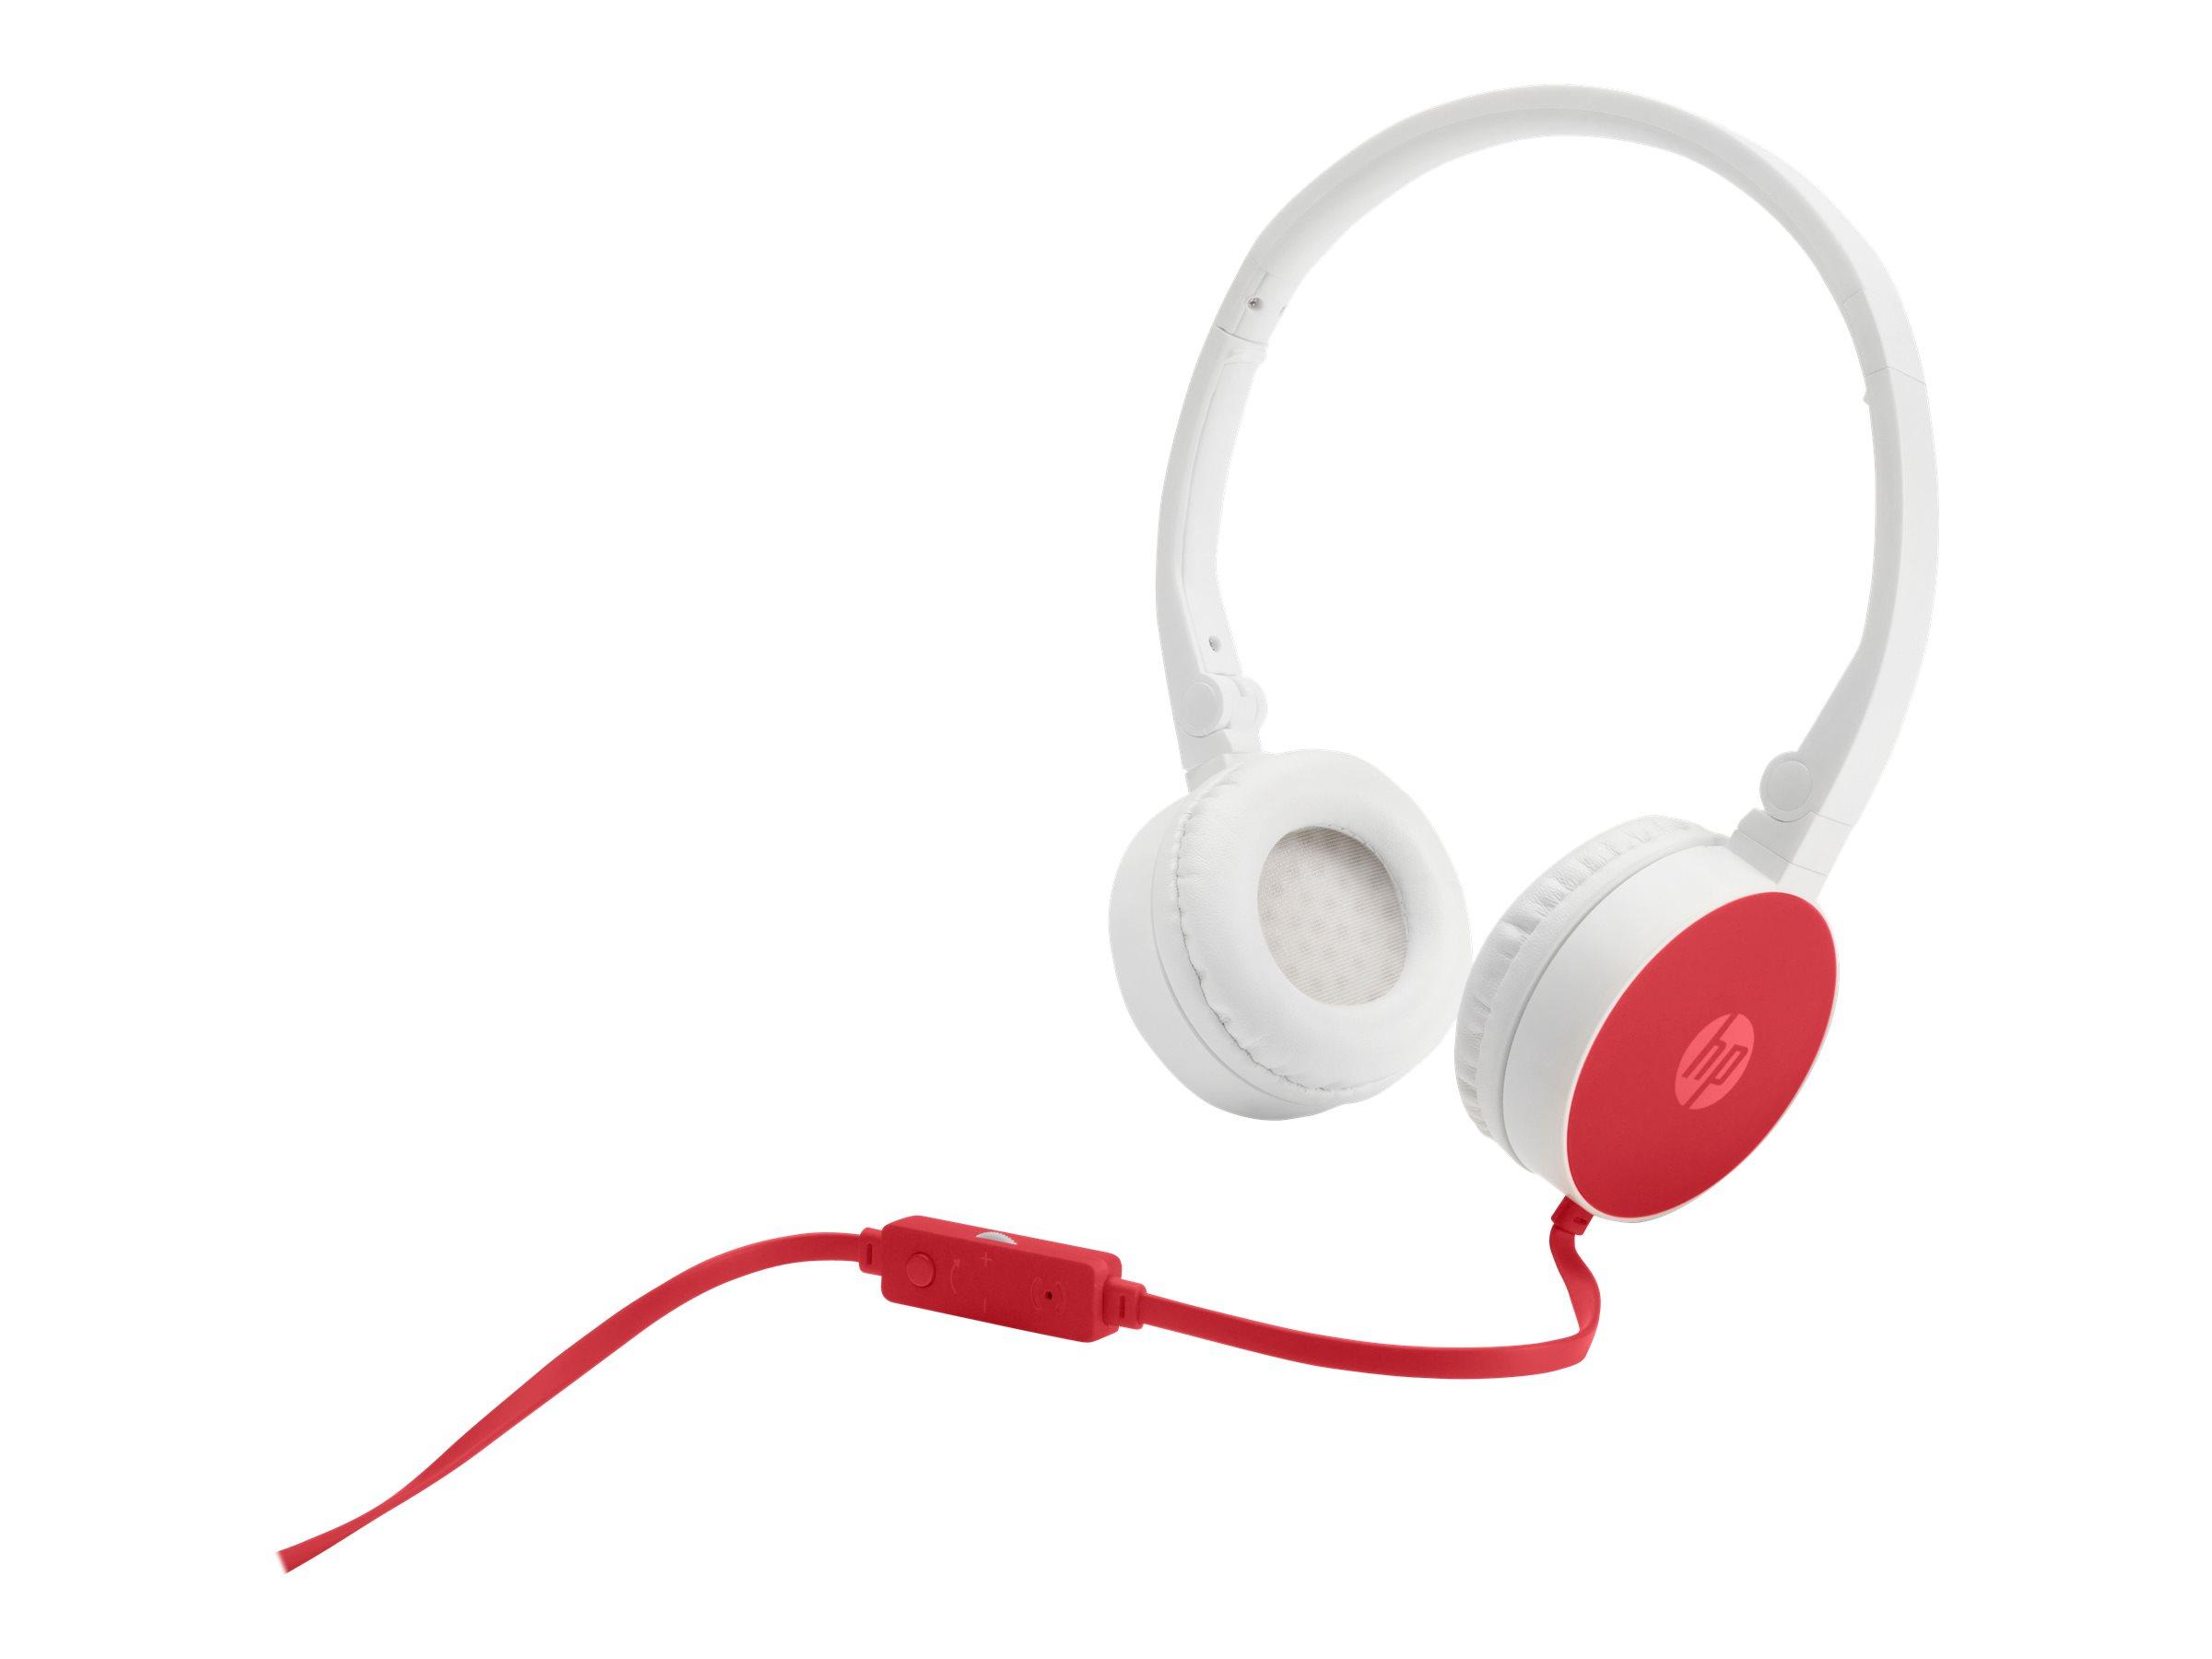 HP H2800 - Kopfhörer mit Mikrofon - On-Ear - kabelgebunden - 3,5 mm Stecker - Rot